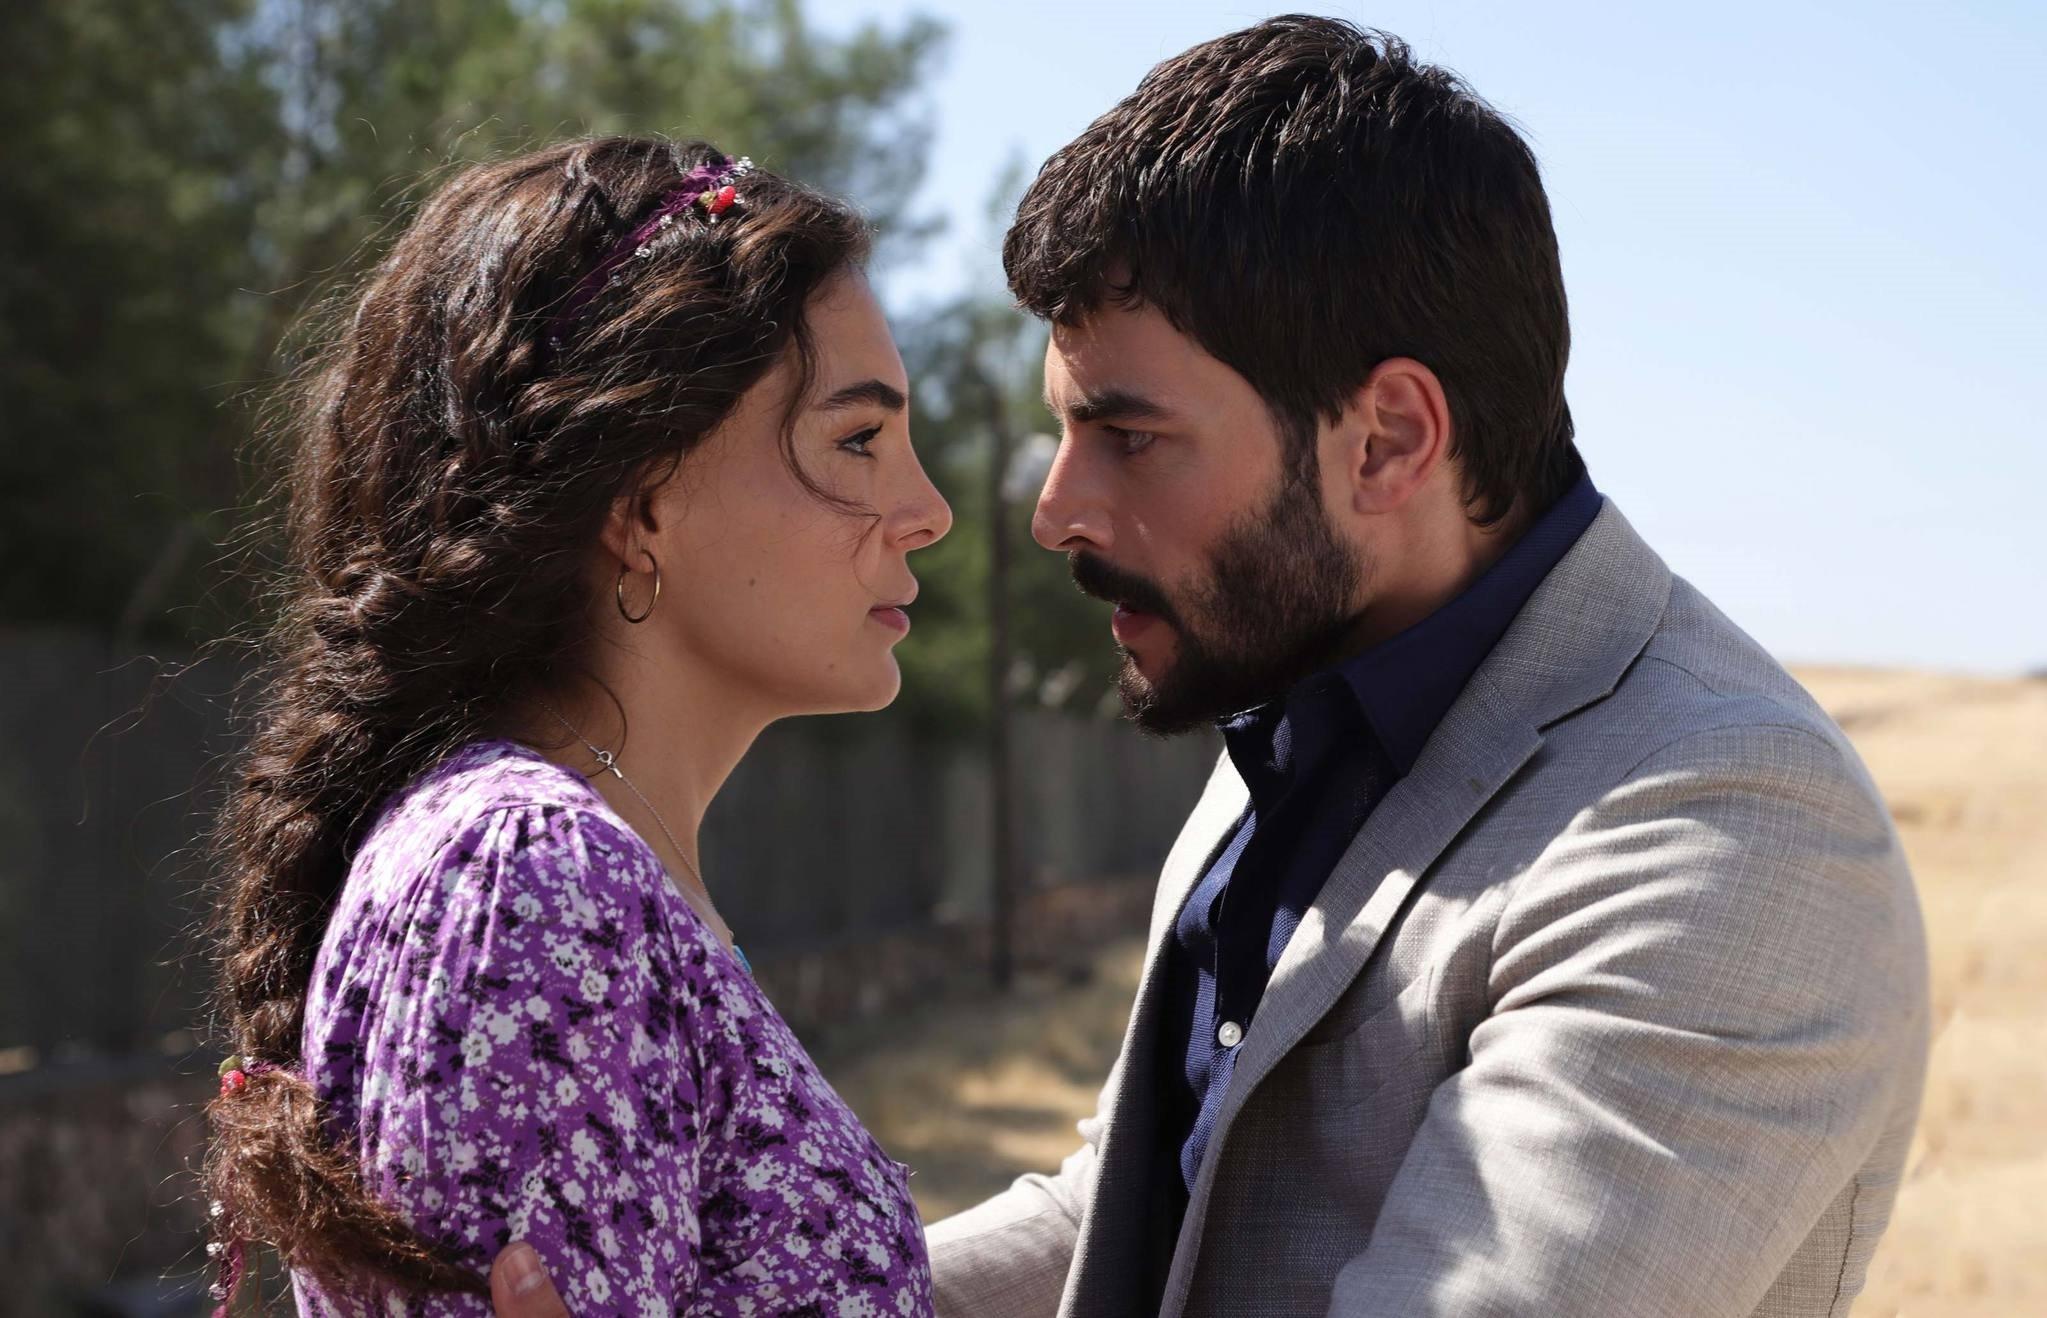 Reyyan (Ebru Şahin) and Miran (Akın Akınözü)